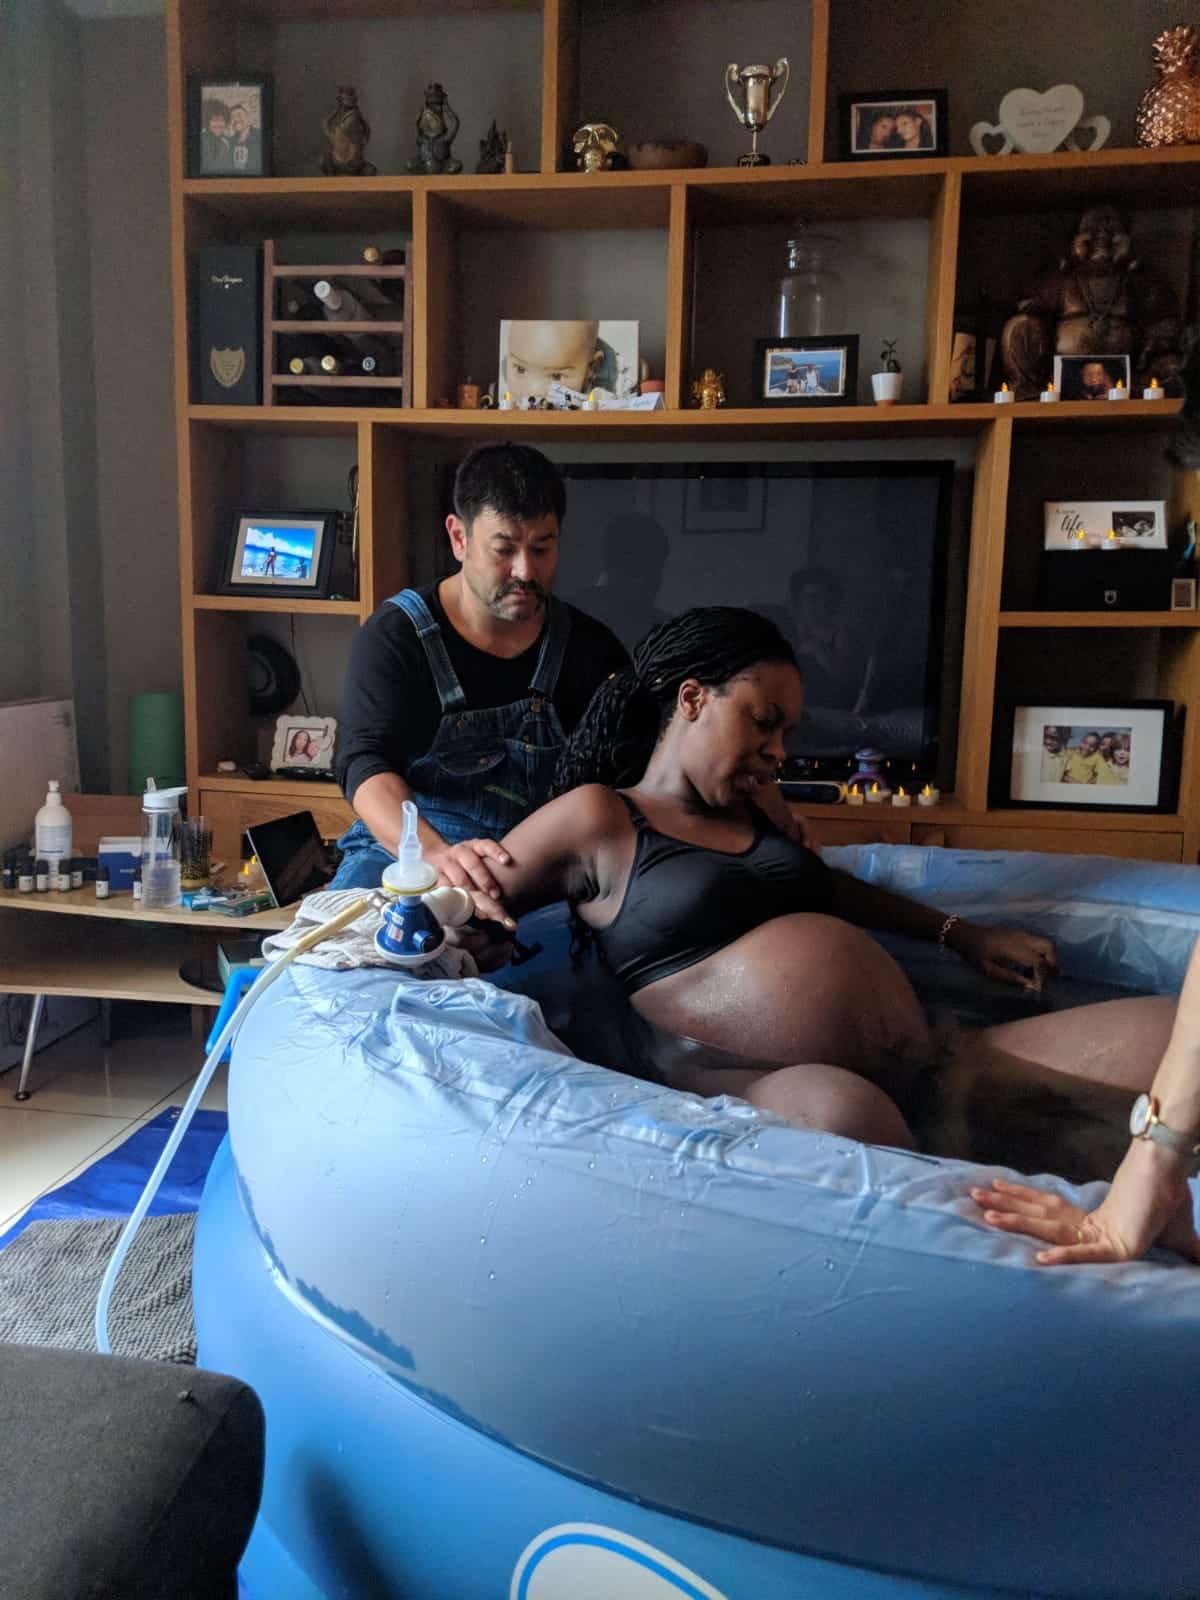 water birth at home